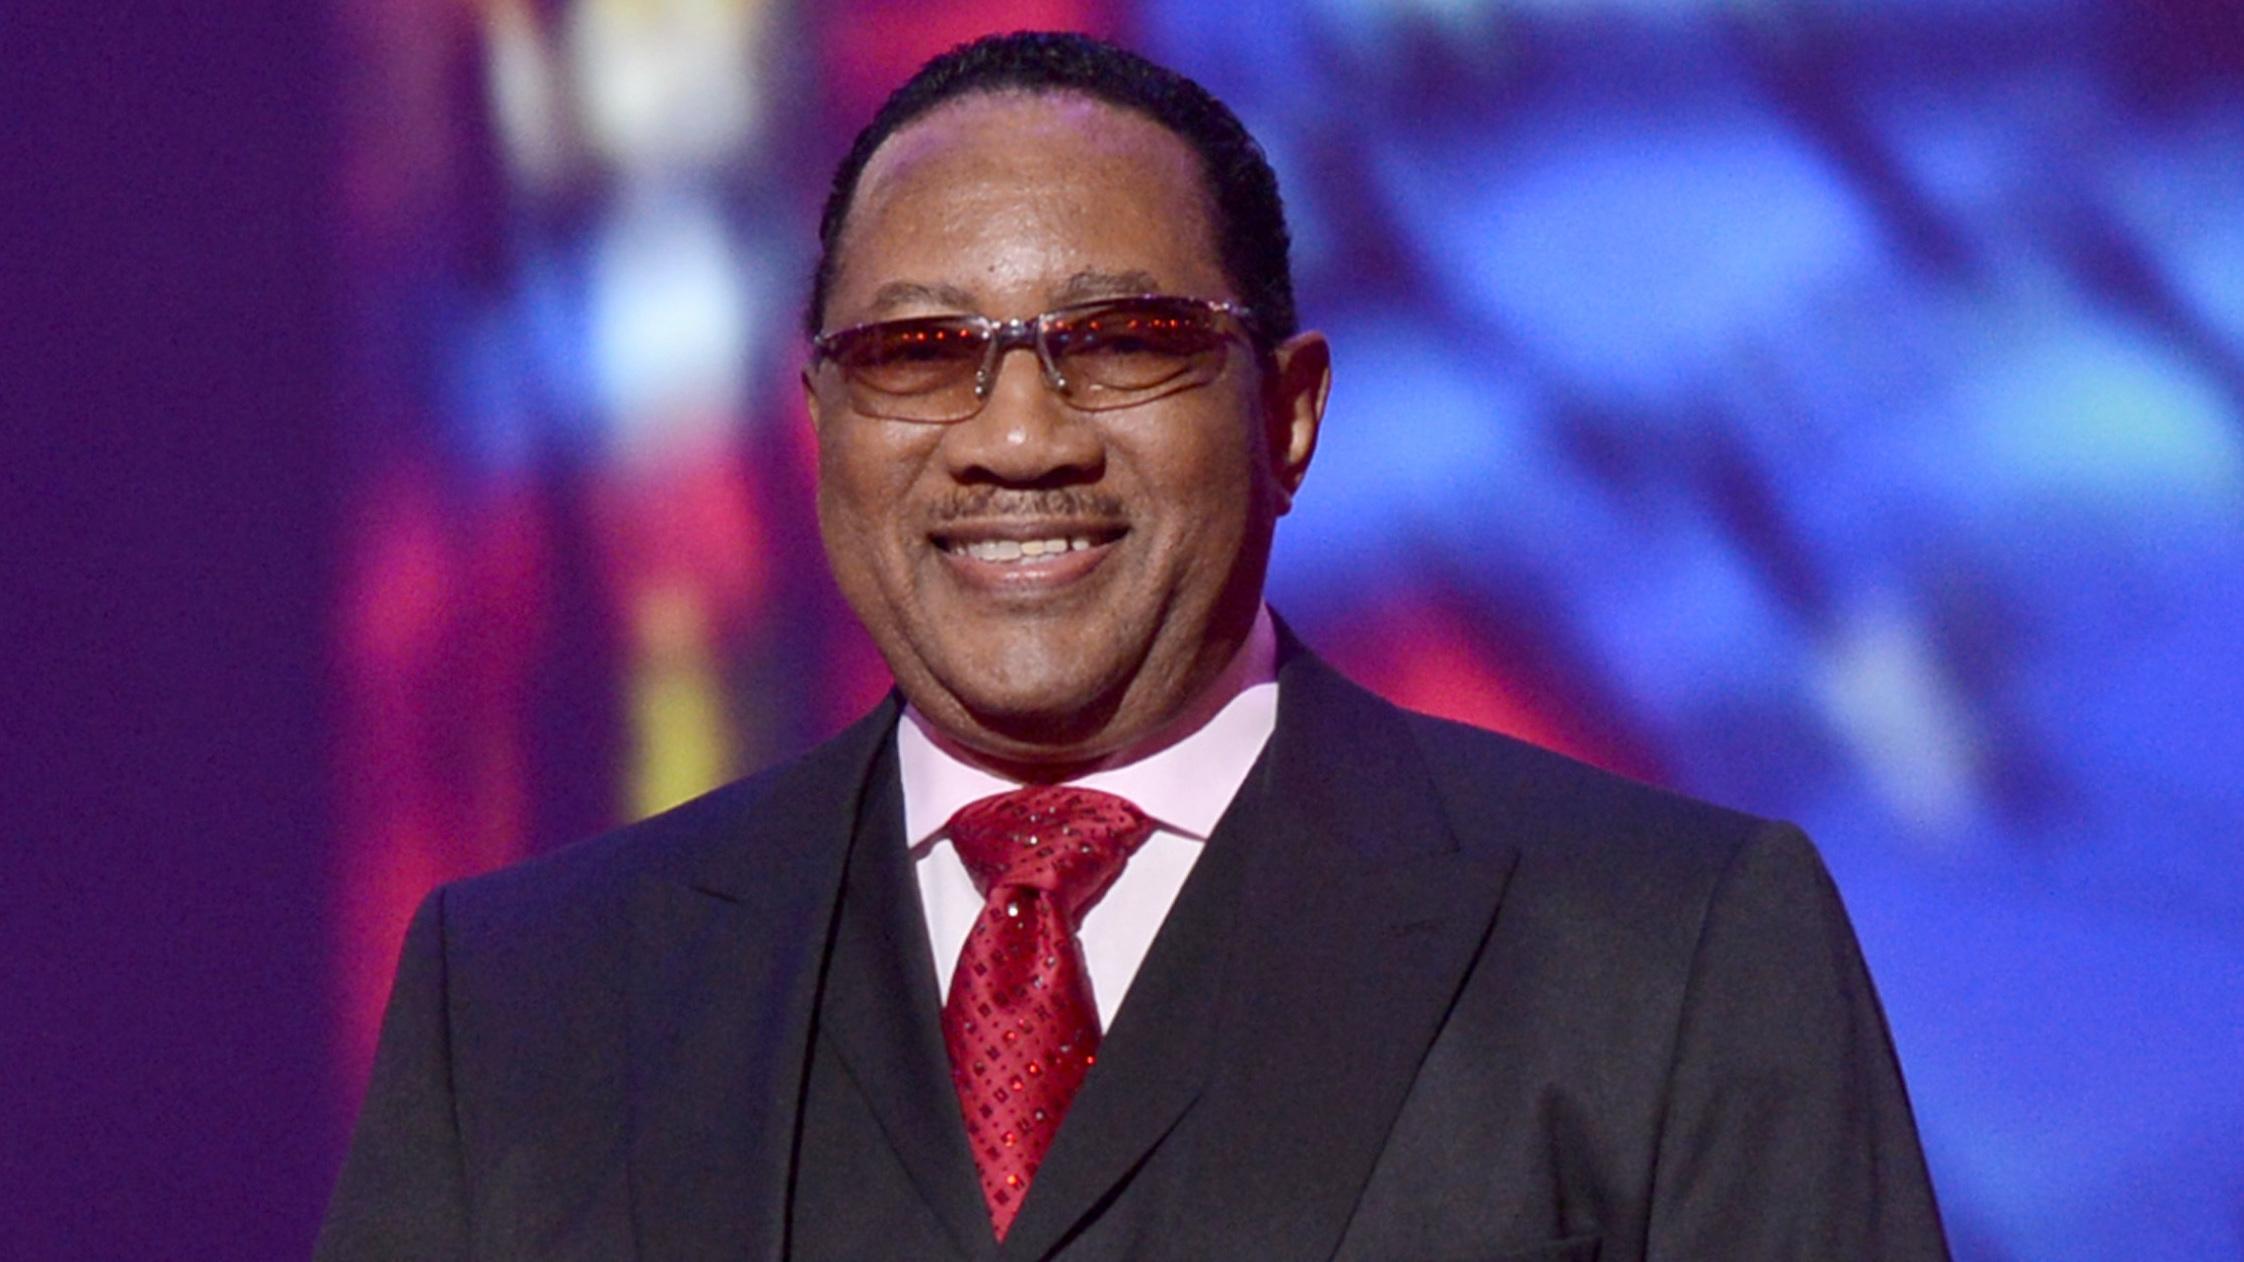 Bobby jones gospel on bet all pro sports betting